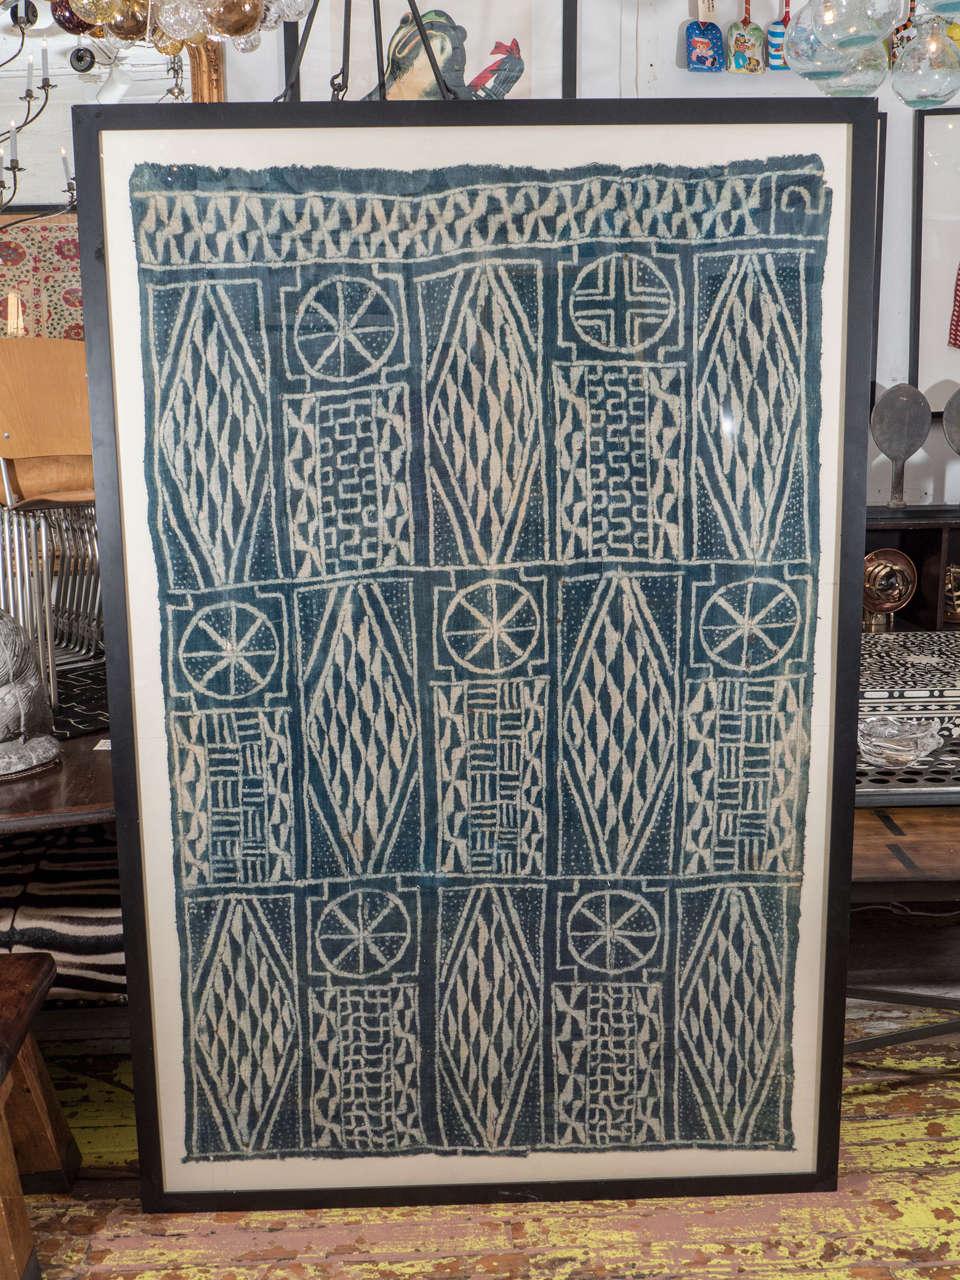 Indigo hand dyed ceremonial cloth. Woven on narrow 19